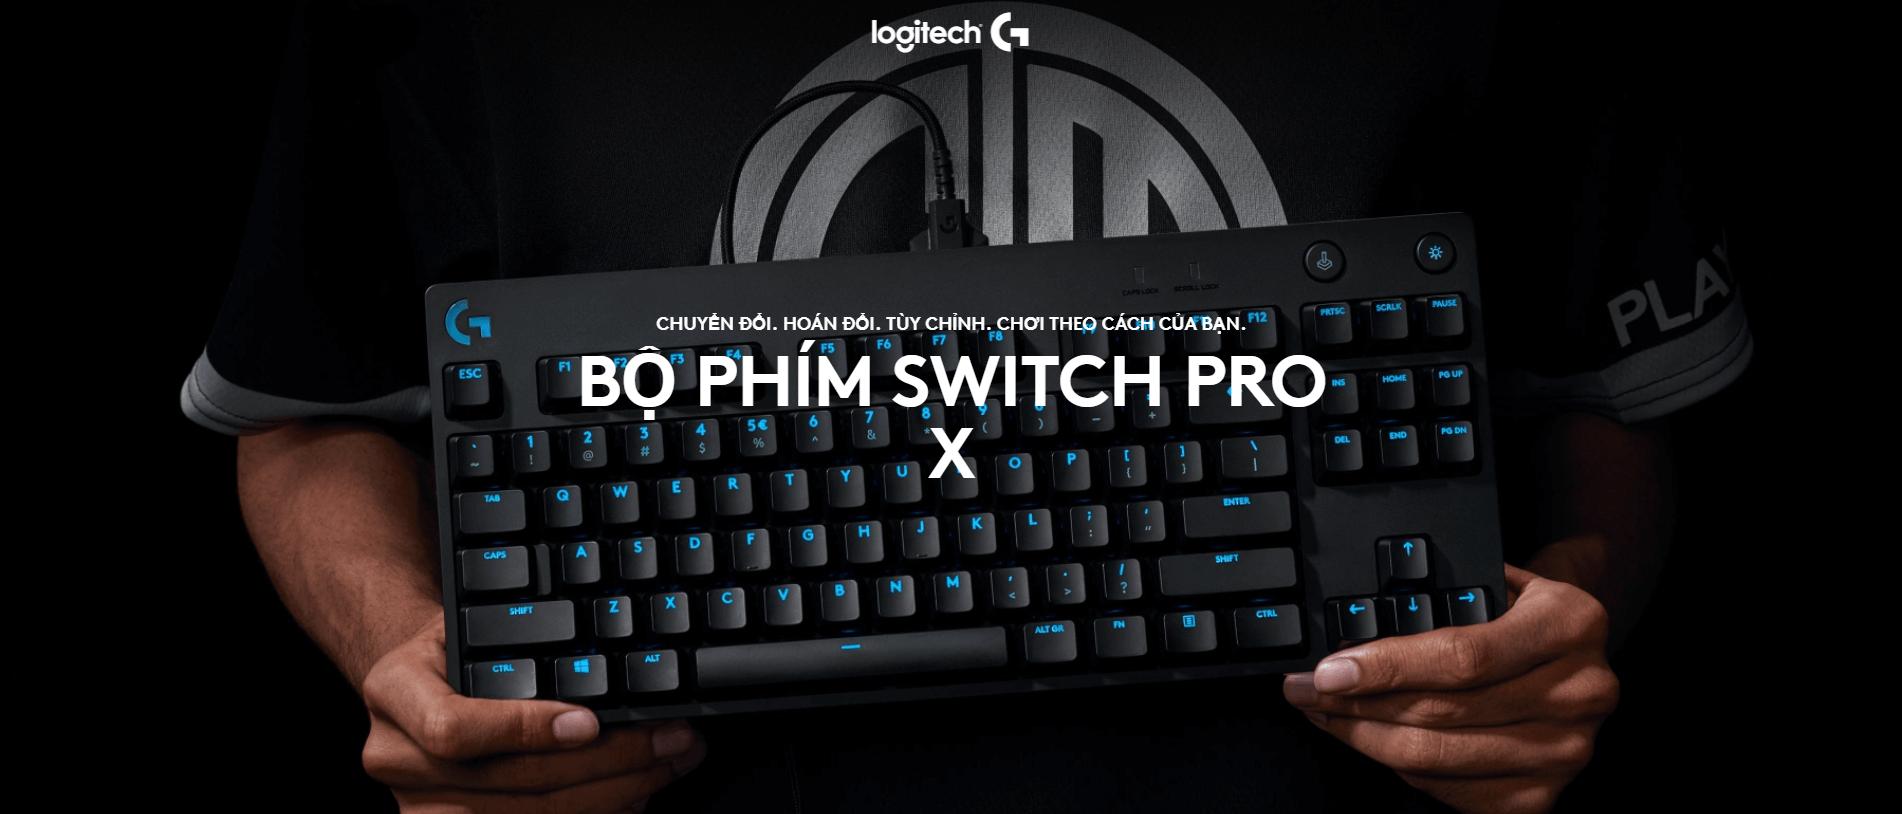 Giới thiệu Bộ switch cho G Pro X Keyboard - GX Blue Clicky RGB switch (943-000325)